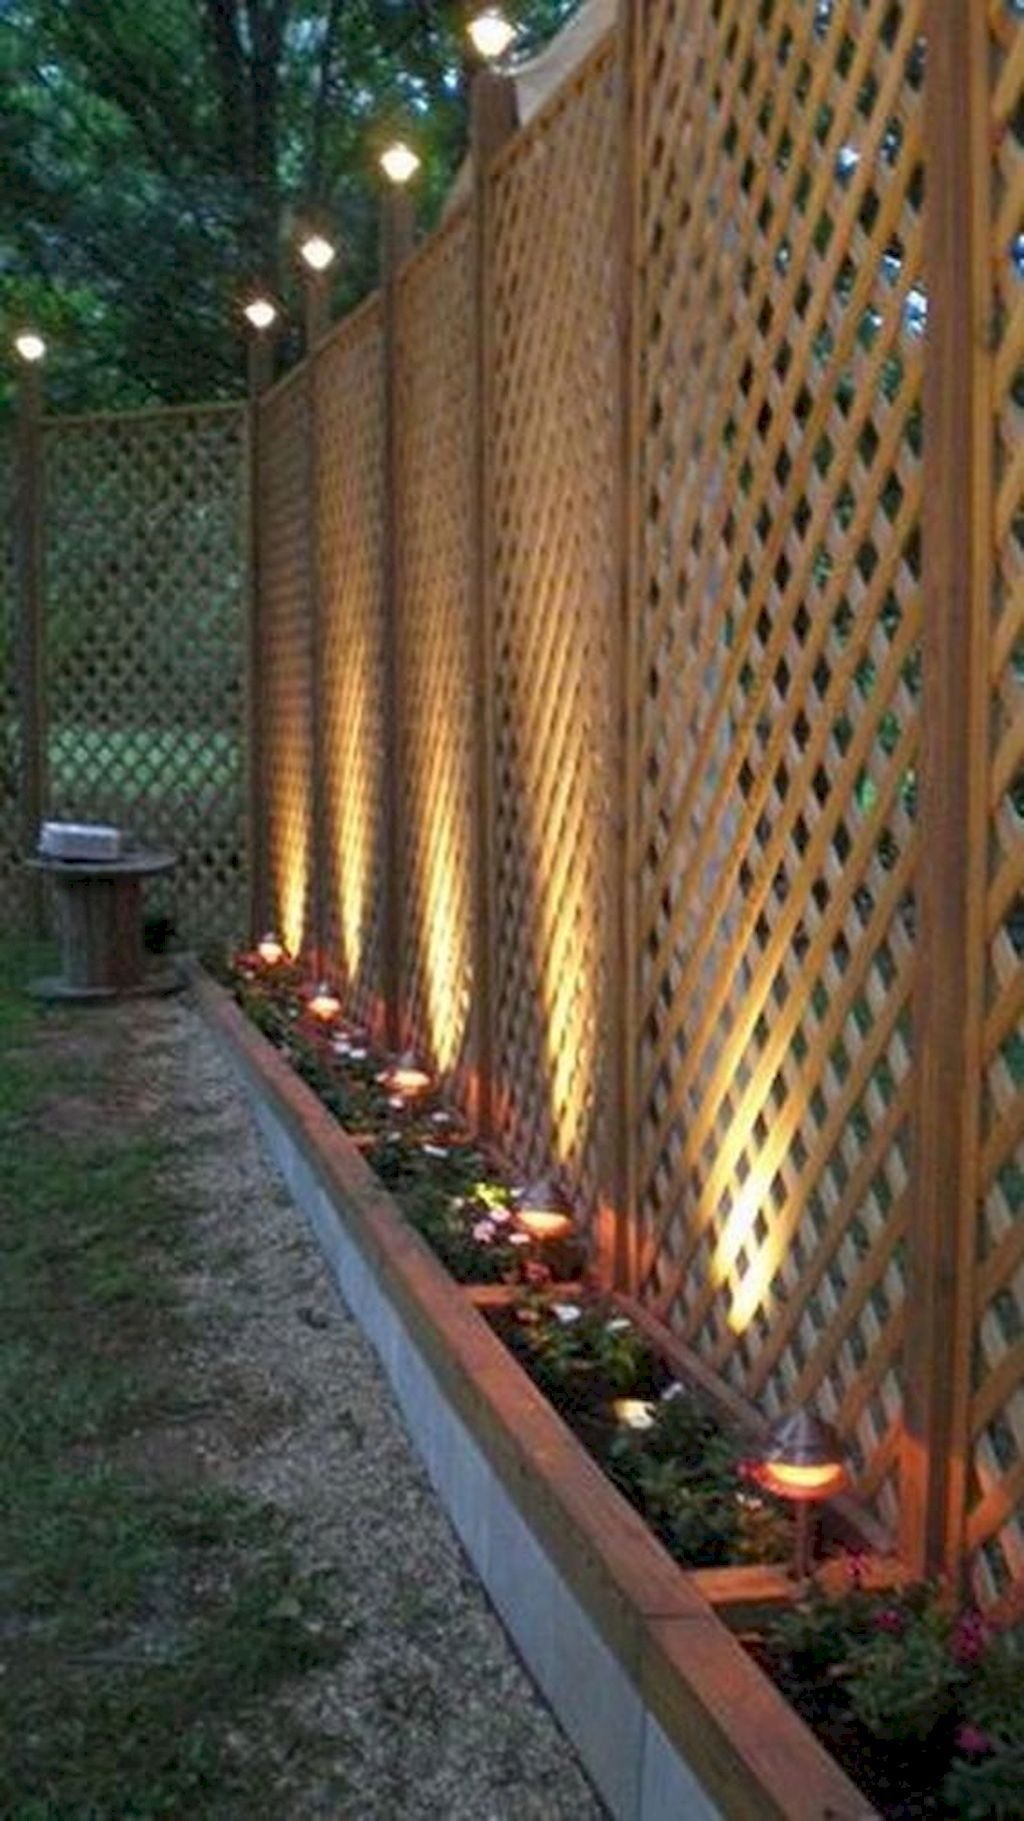 85 Marvelous Backyard Privacy Fence Decor Ideas on A ... on Backyard Wooden Fence Decorating Ideas  id=95067